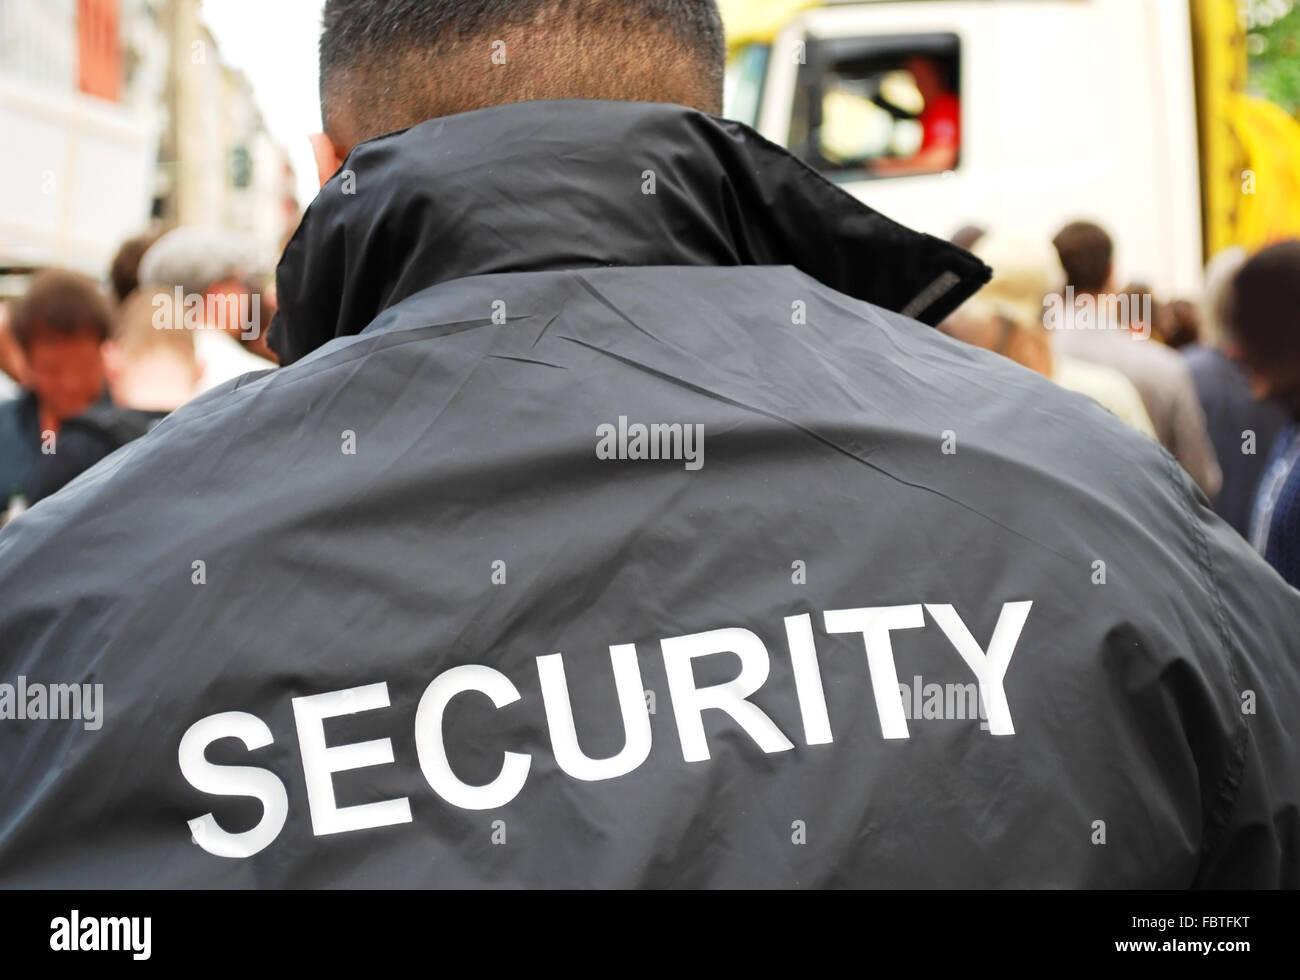 security man - Stock Image